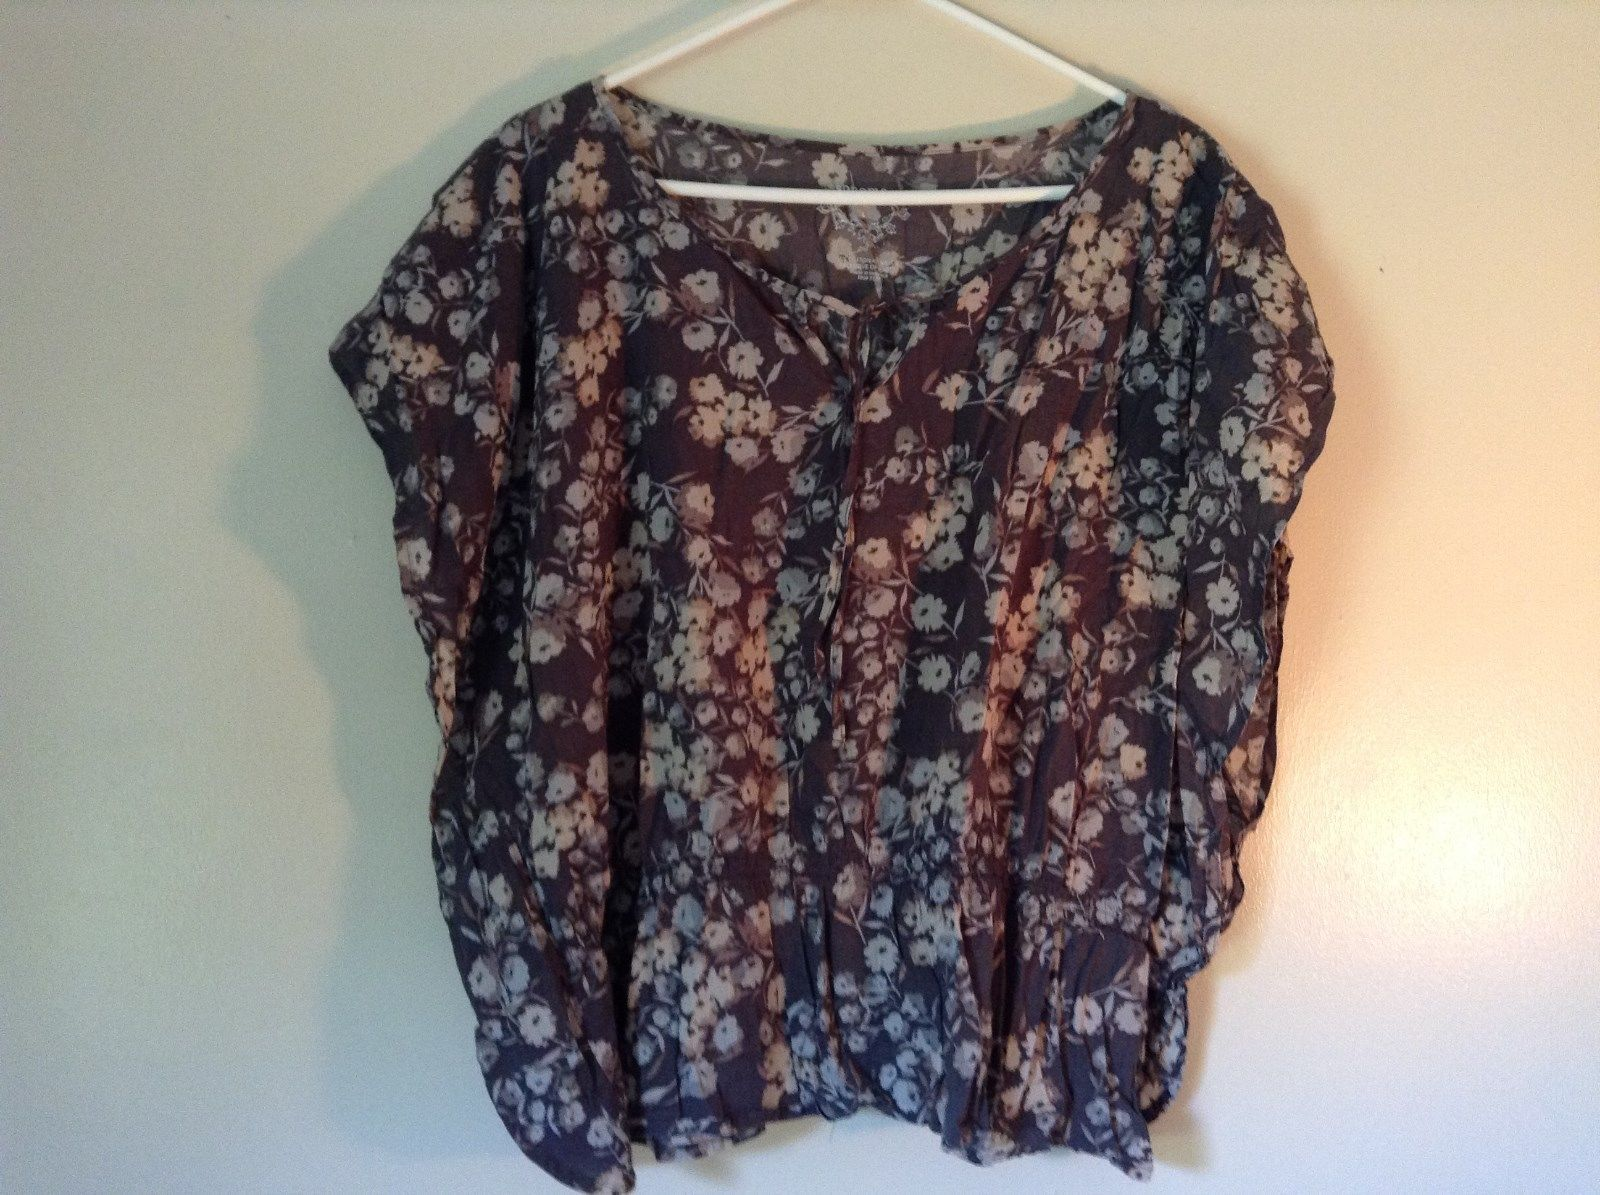 Sonoma Gray Sleeveless Shirt with Flowers Size Large